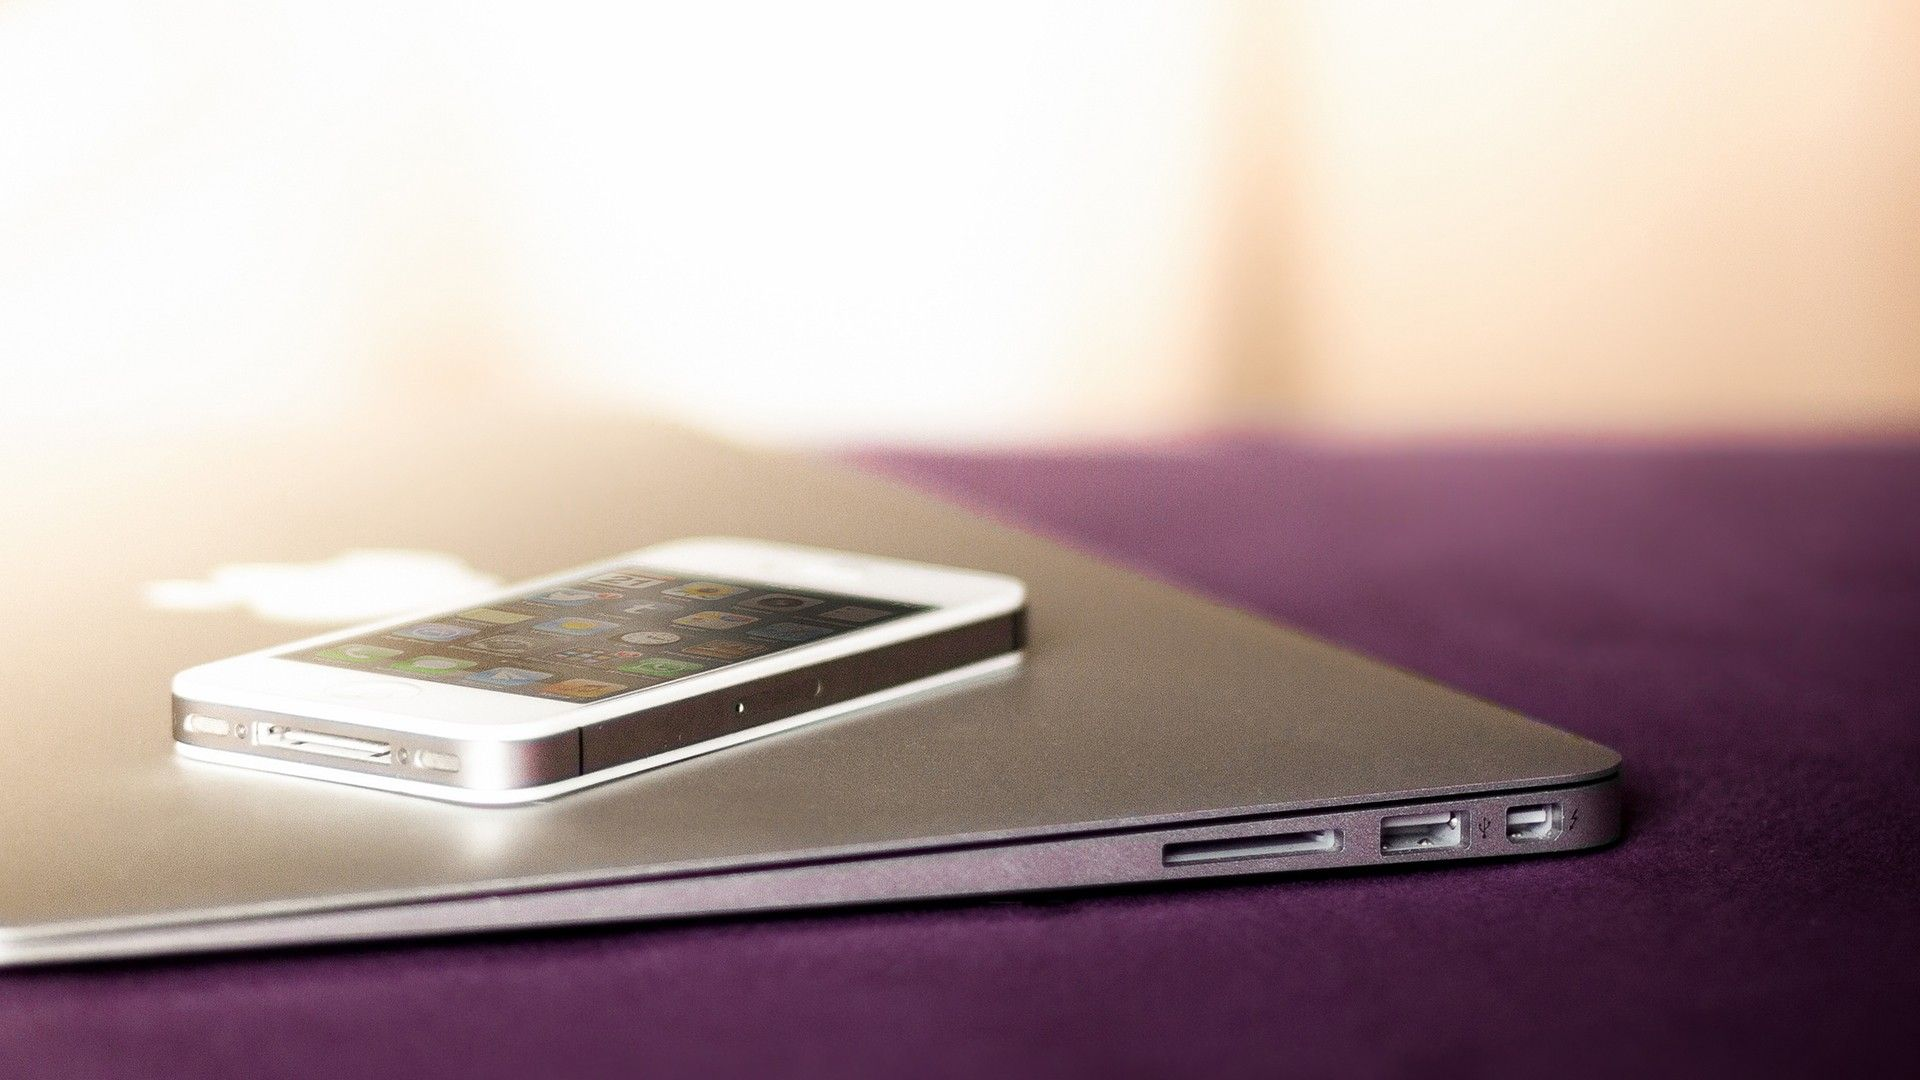 iphone Apple iphone 4s, Iphone, White iphone